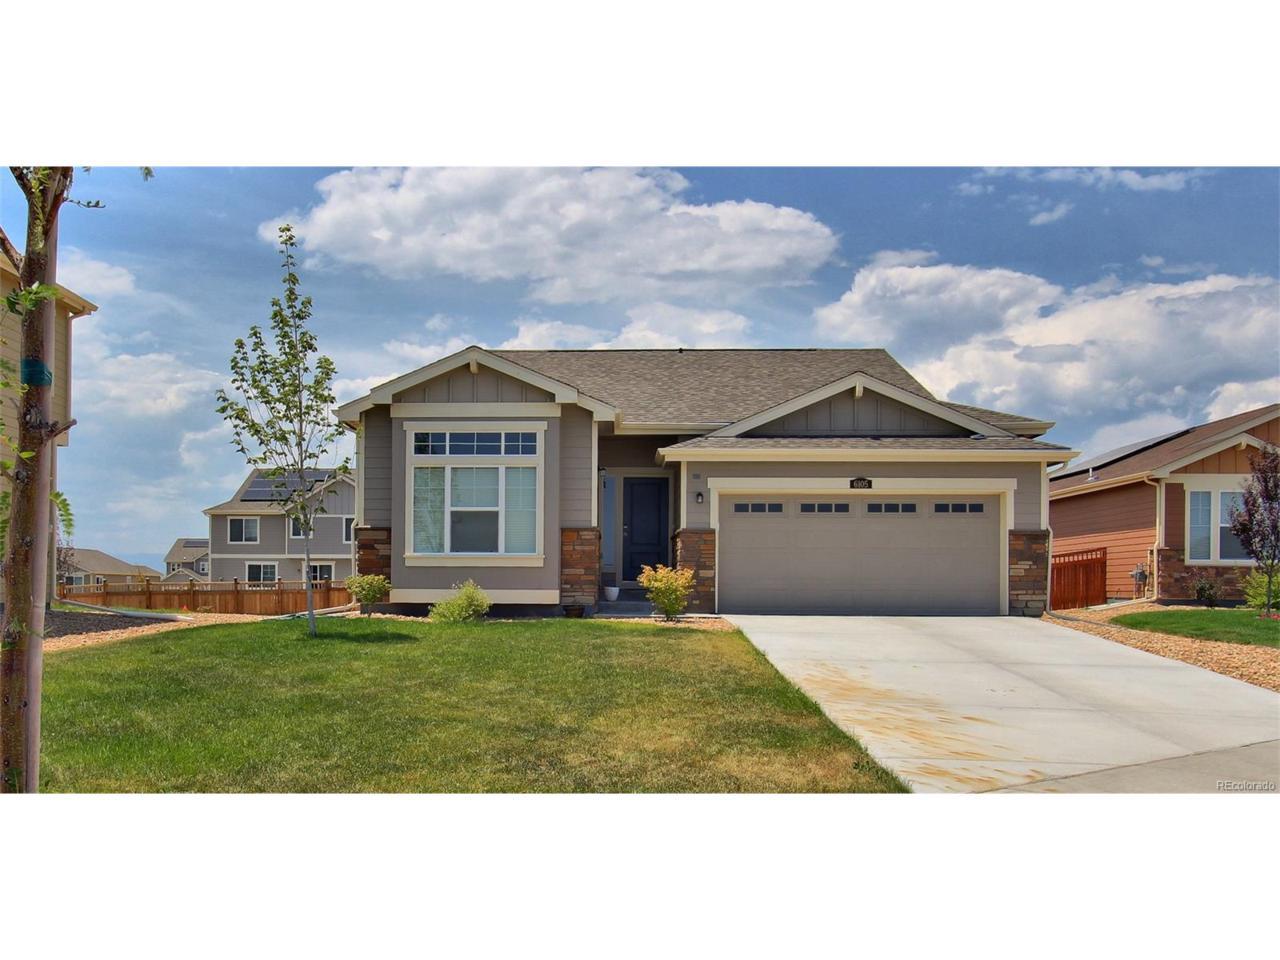 6105 Miners Peak Circle, Frederick, CO 80516 (MLS #7432744) :: 8z Real Estate